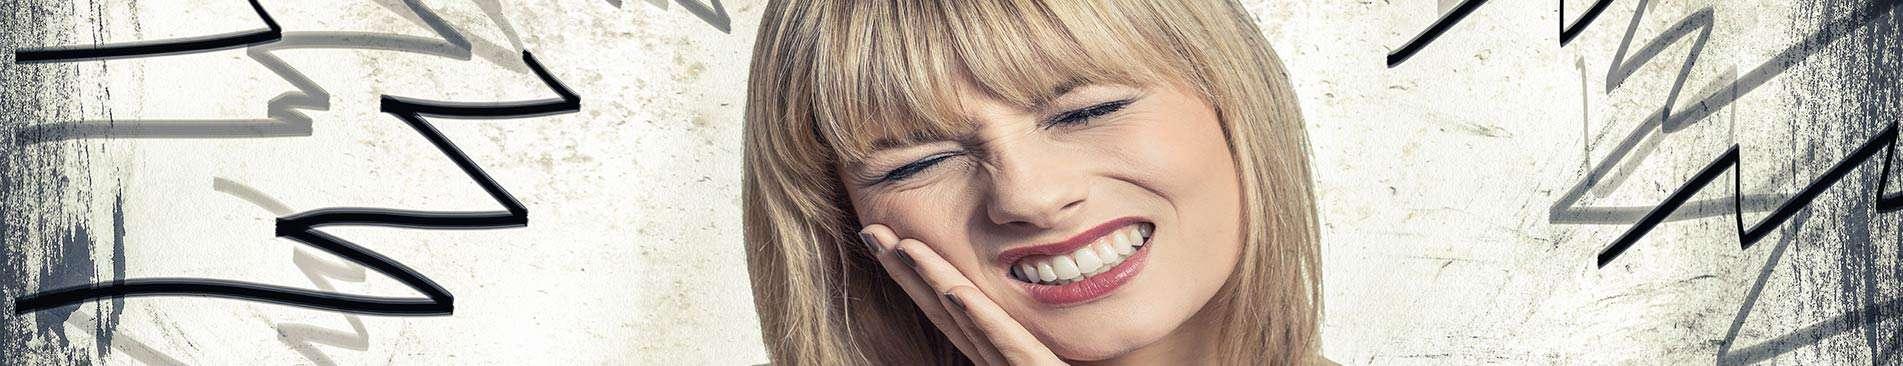 Dental-Extractions-in-Gevena-Dentist